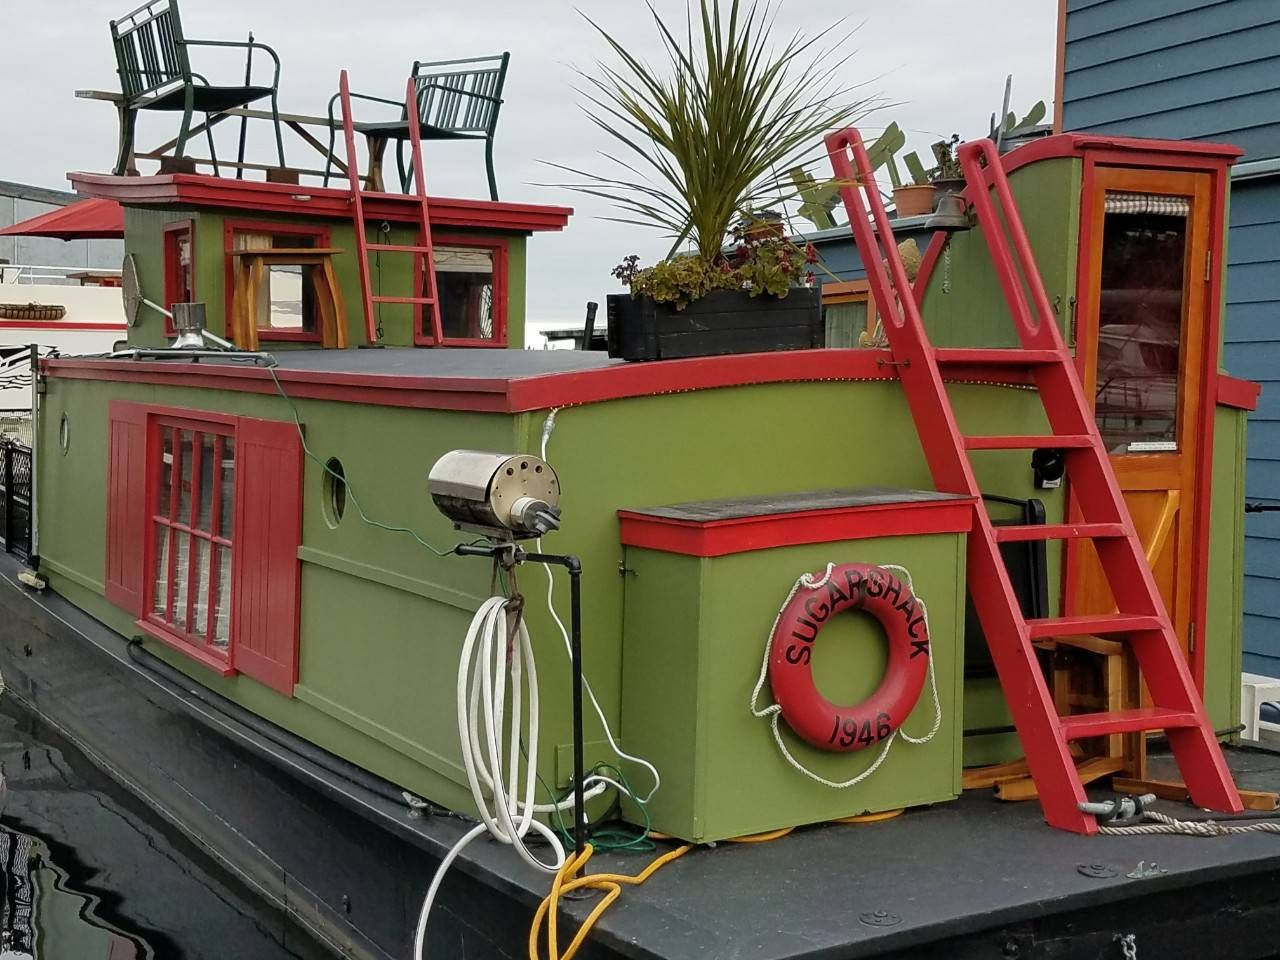 Sugar shack houseboat